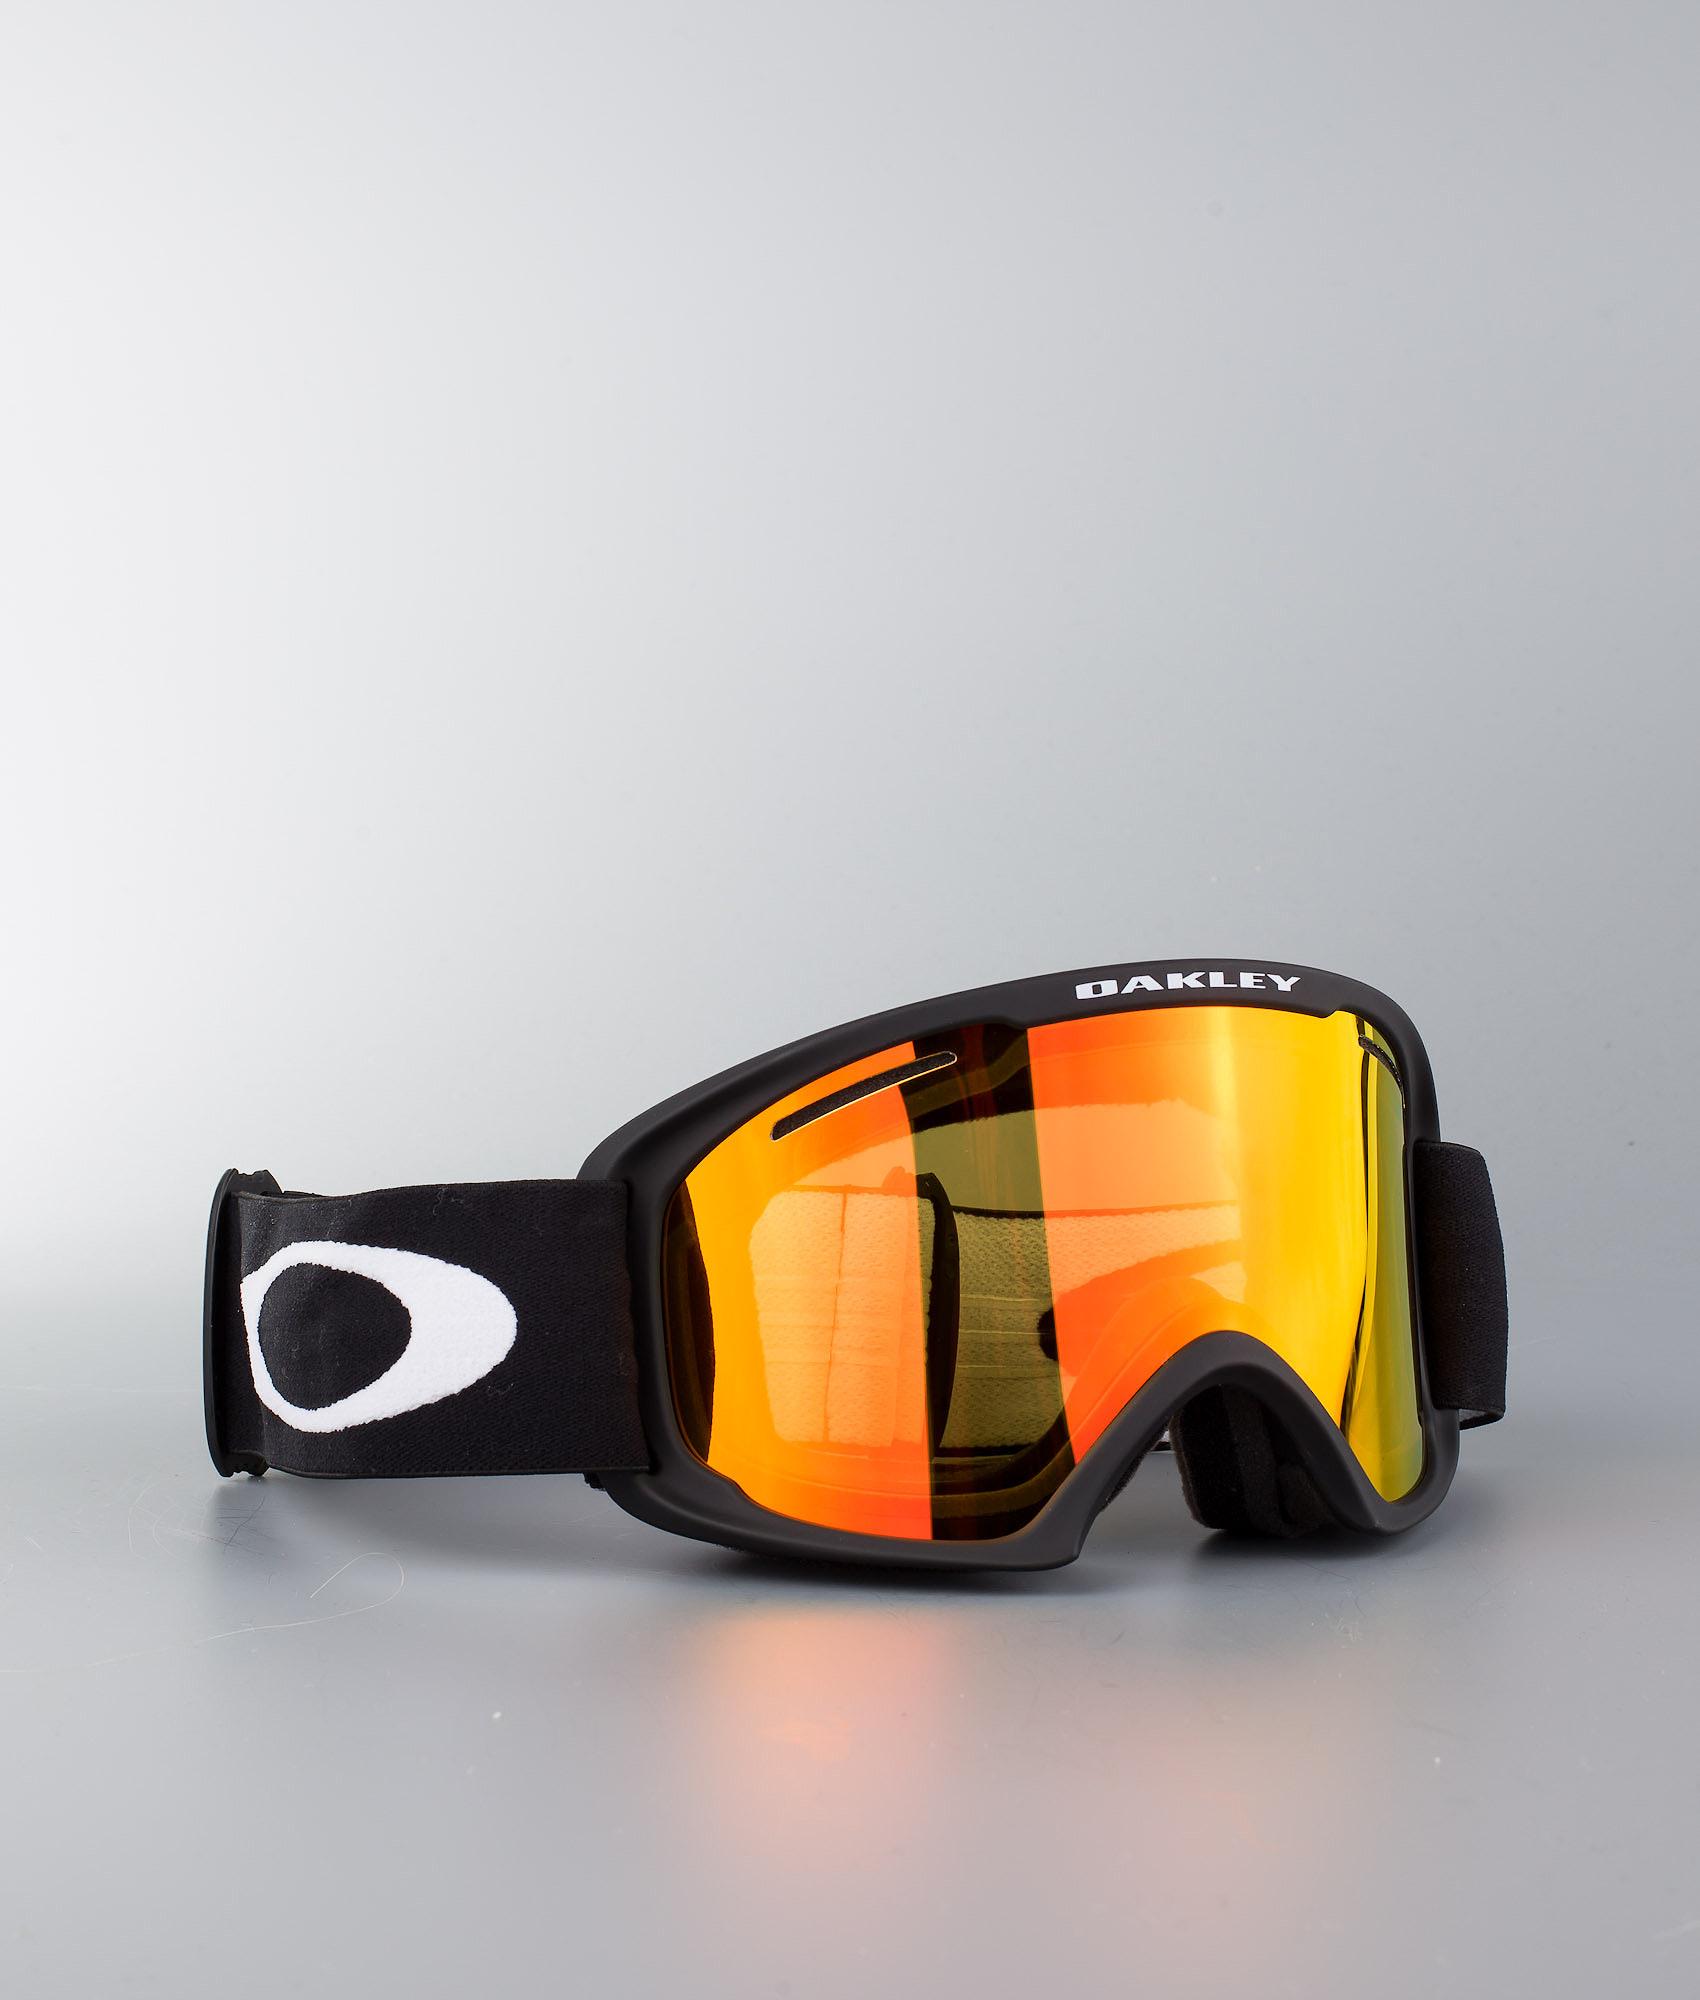 2ababc76da Oakley O Frame 2.0 XL Ski Goggle Matte Black W Fire Iridium ...